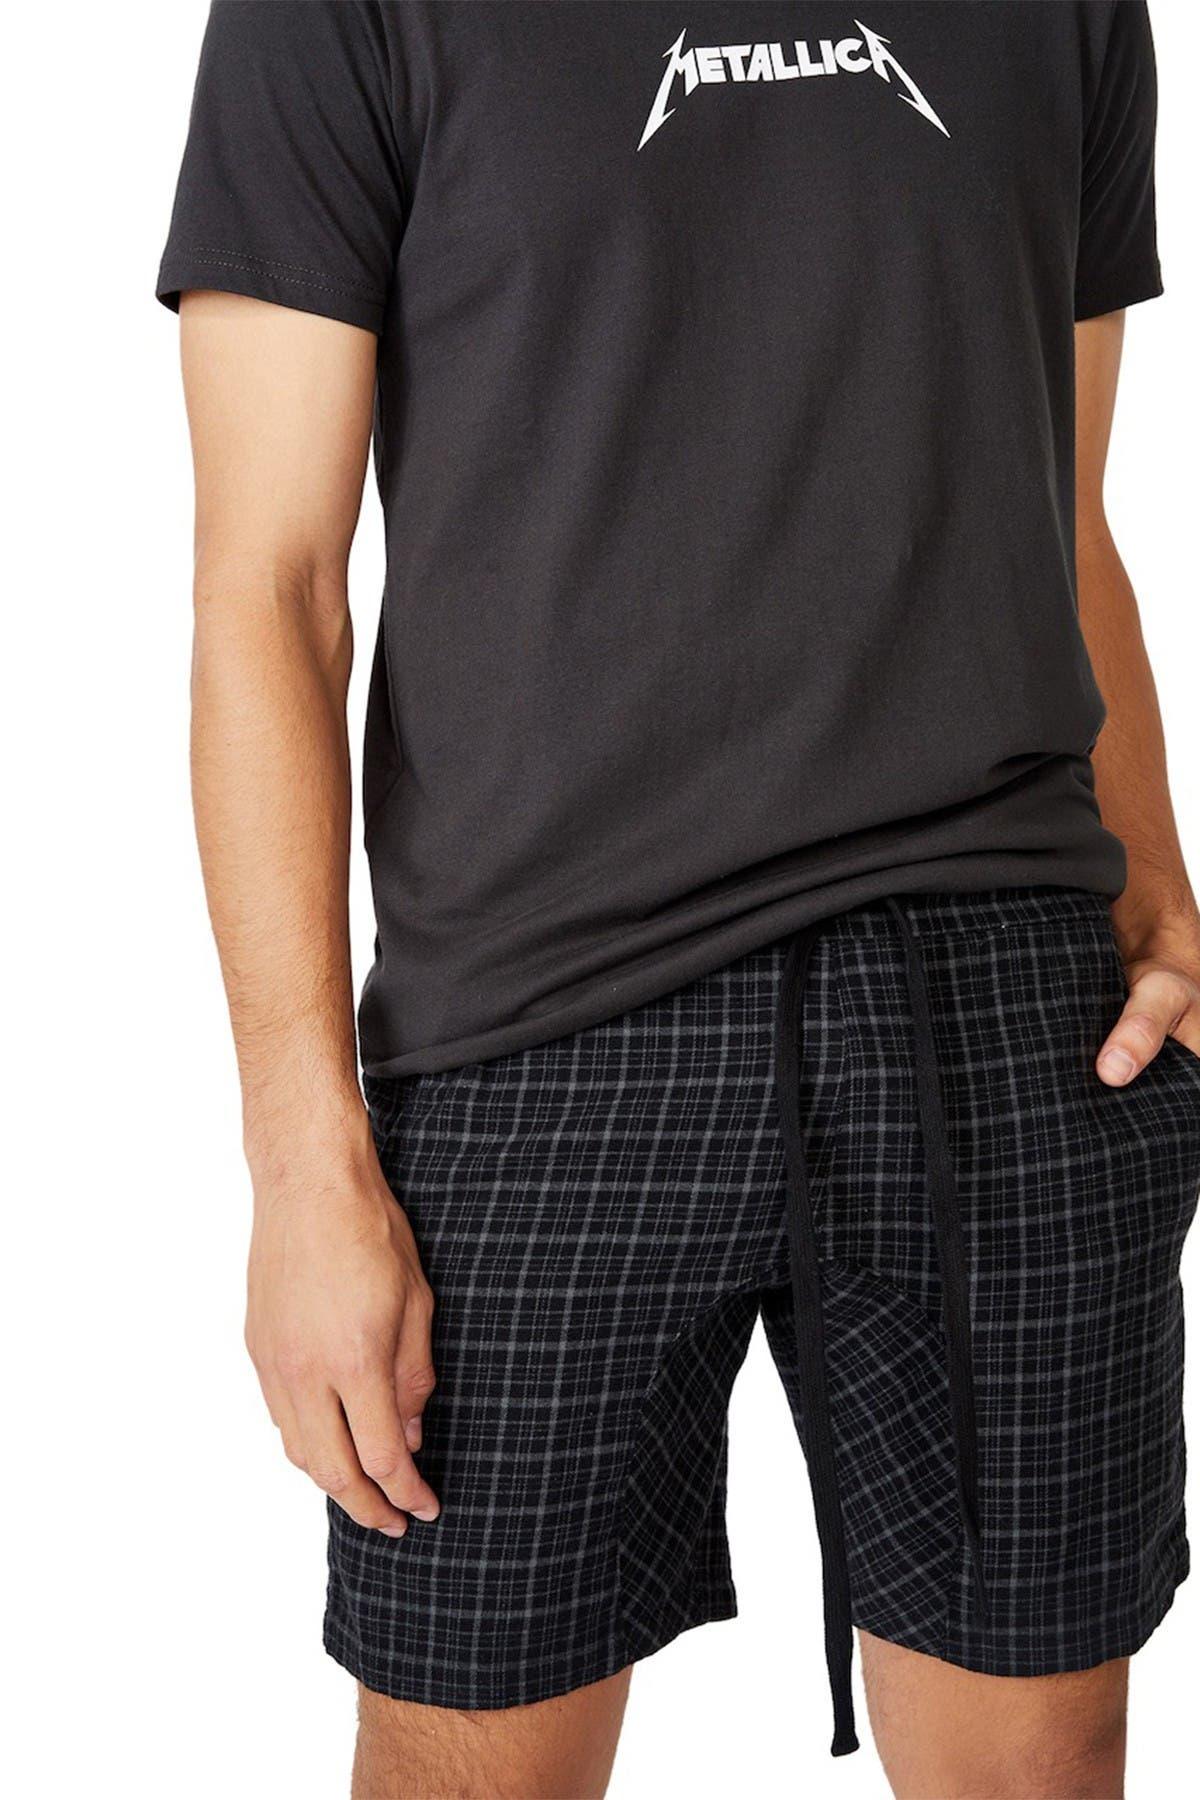 Image of Cotton On Lounge Knit Shorts